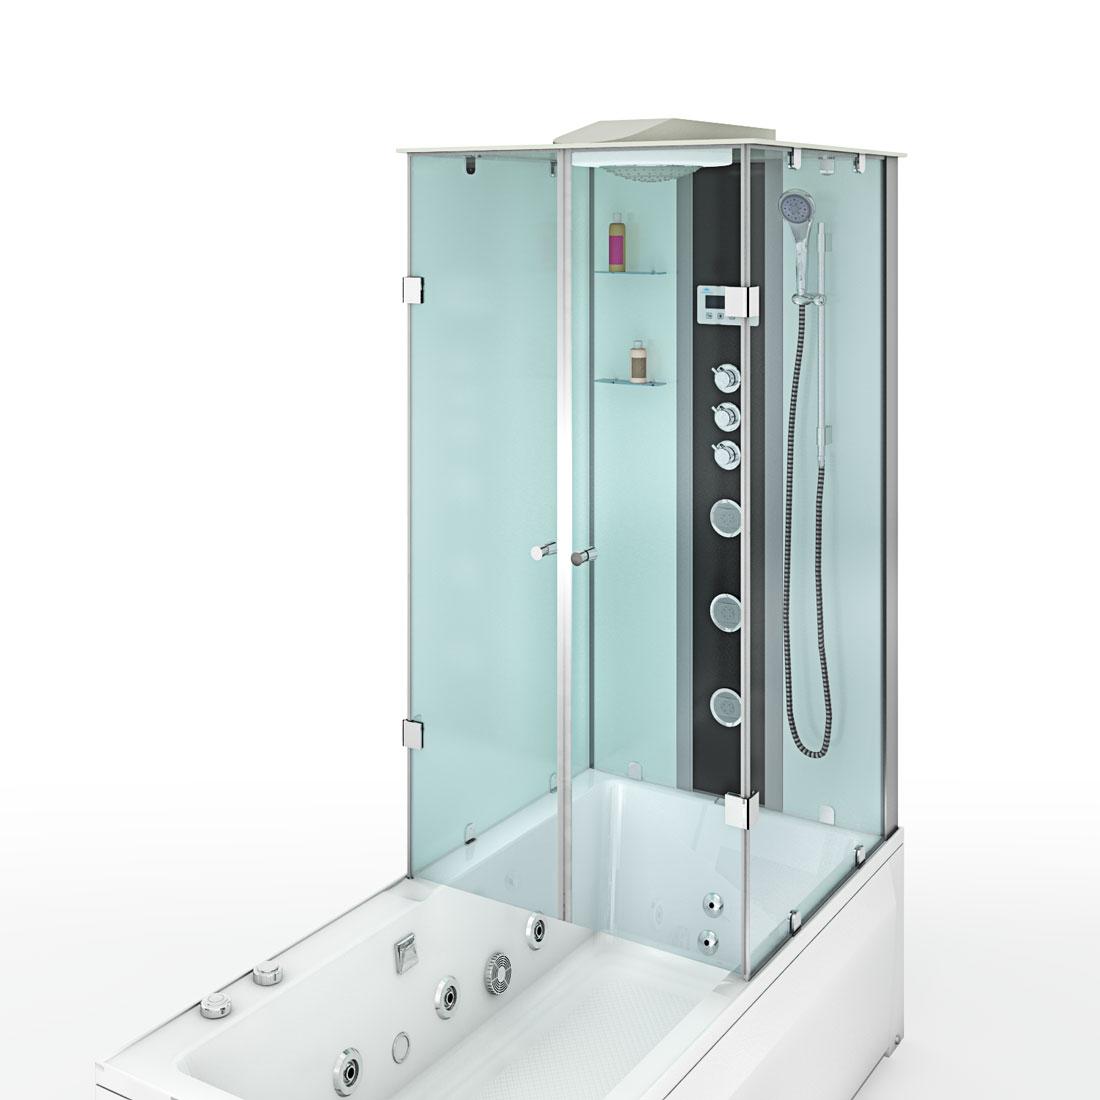 acquavapore dtp50 a007l whirlpool wanne duschtempel dusche duschkabine 180x90 ebay. Black Bedroom Furniture Sets. Home Design Ideas